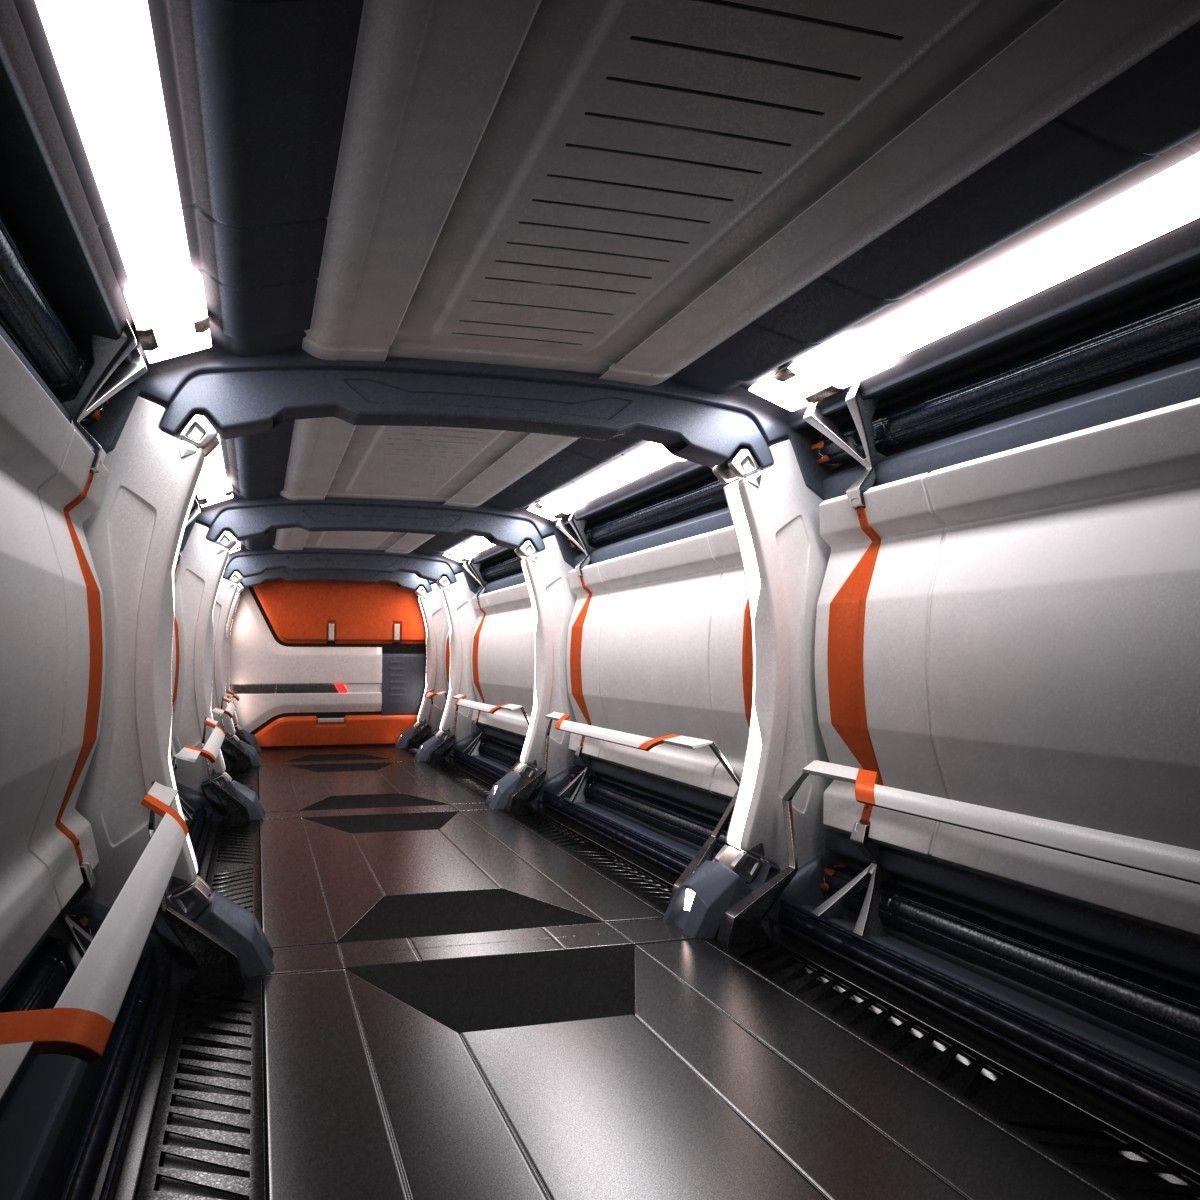 sci fi spaceship corridor 3d max futuristic interior en 2019 futuristic interior spaceship. Black Bedroom Furniture Sets. Home Design Ideas